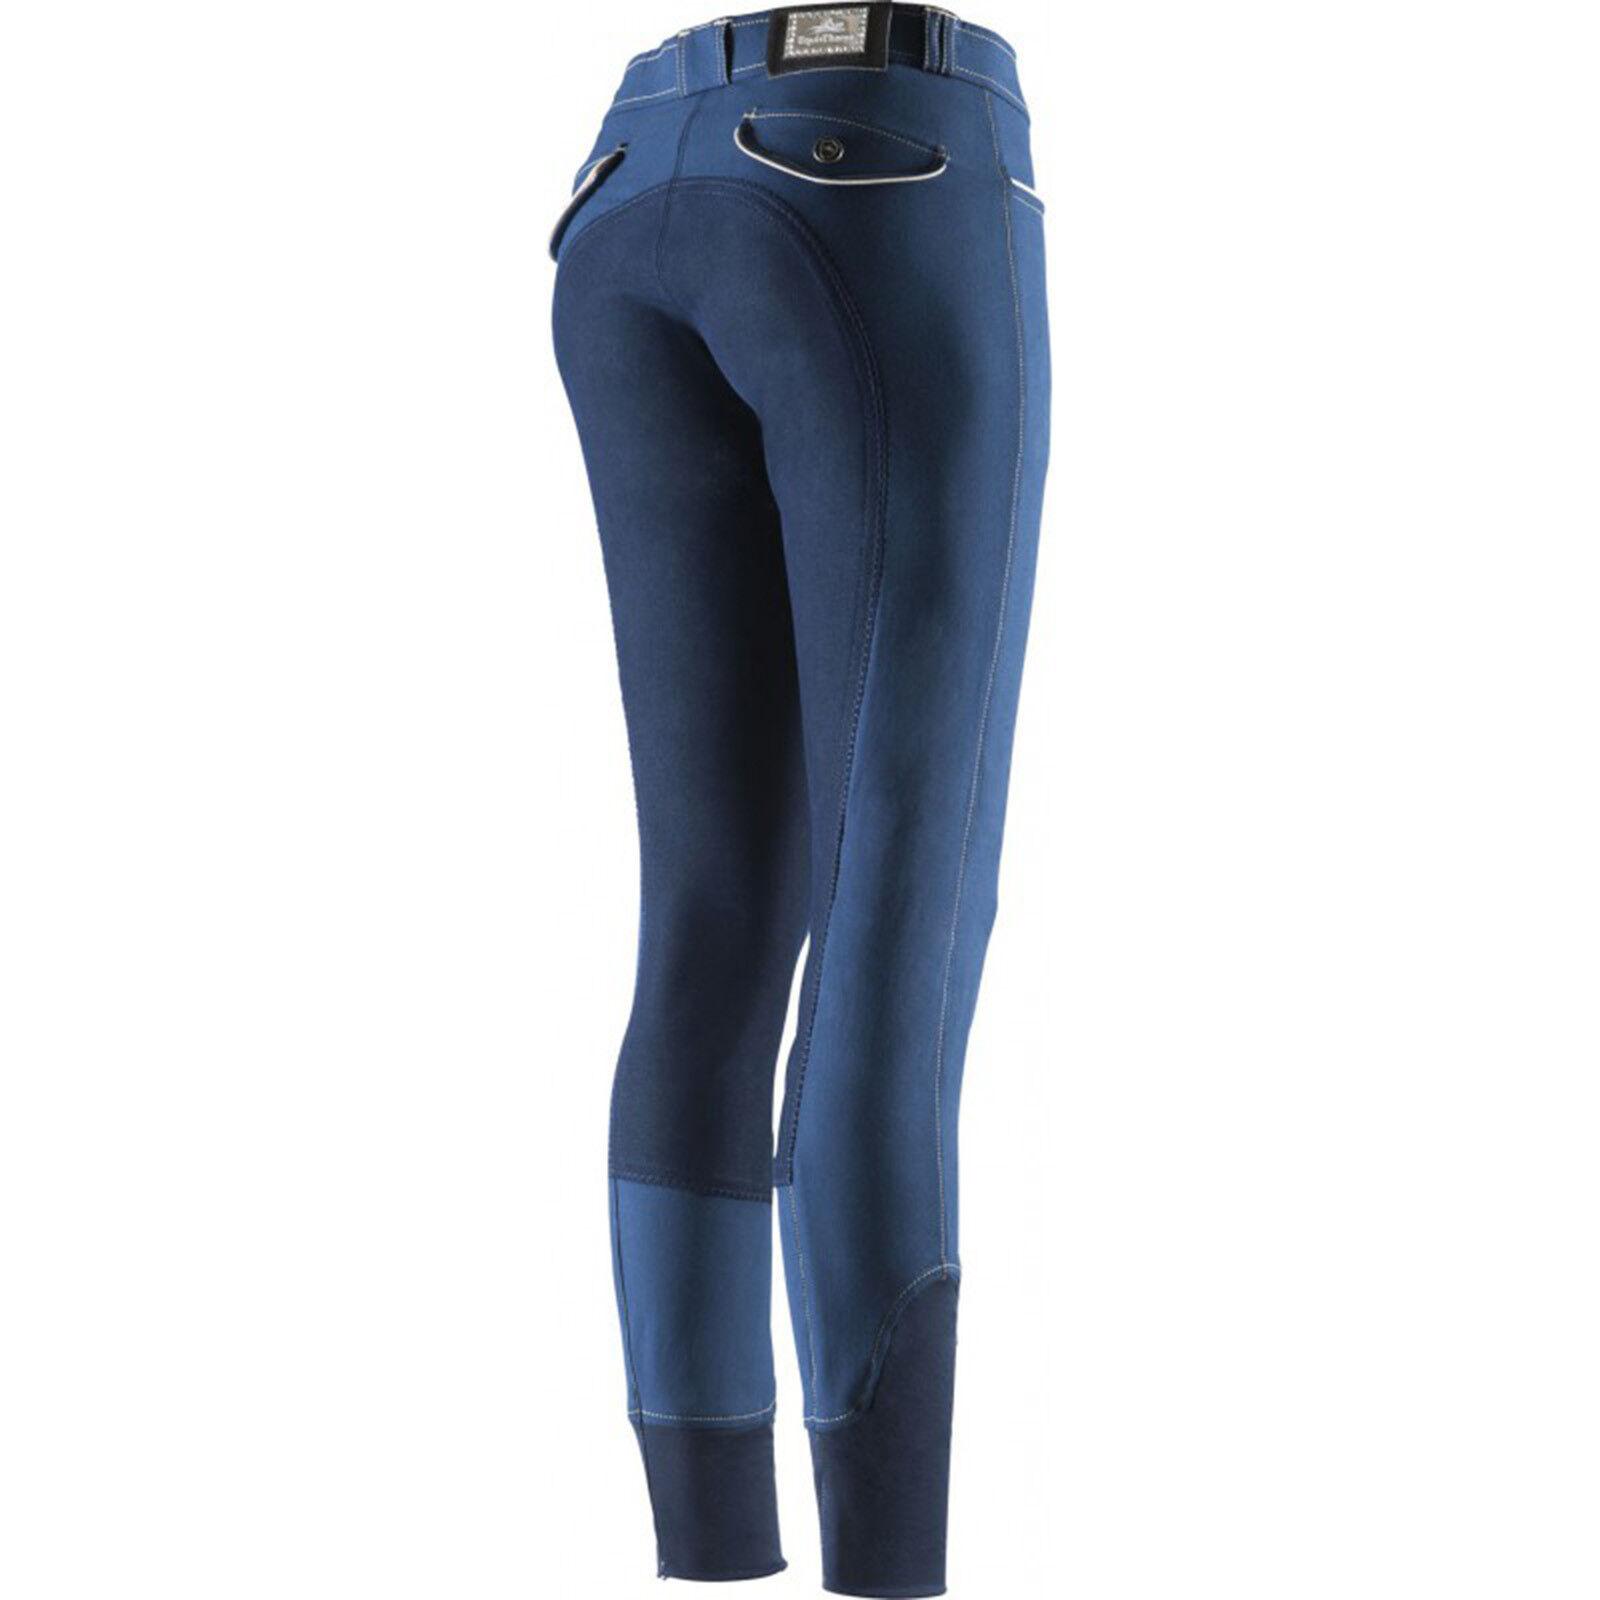 Equi Theme Damen Reithose Verona Vollbesatz marineblau marineblau marineblau 6faef1